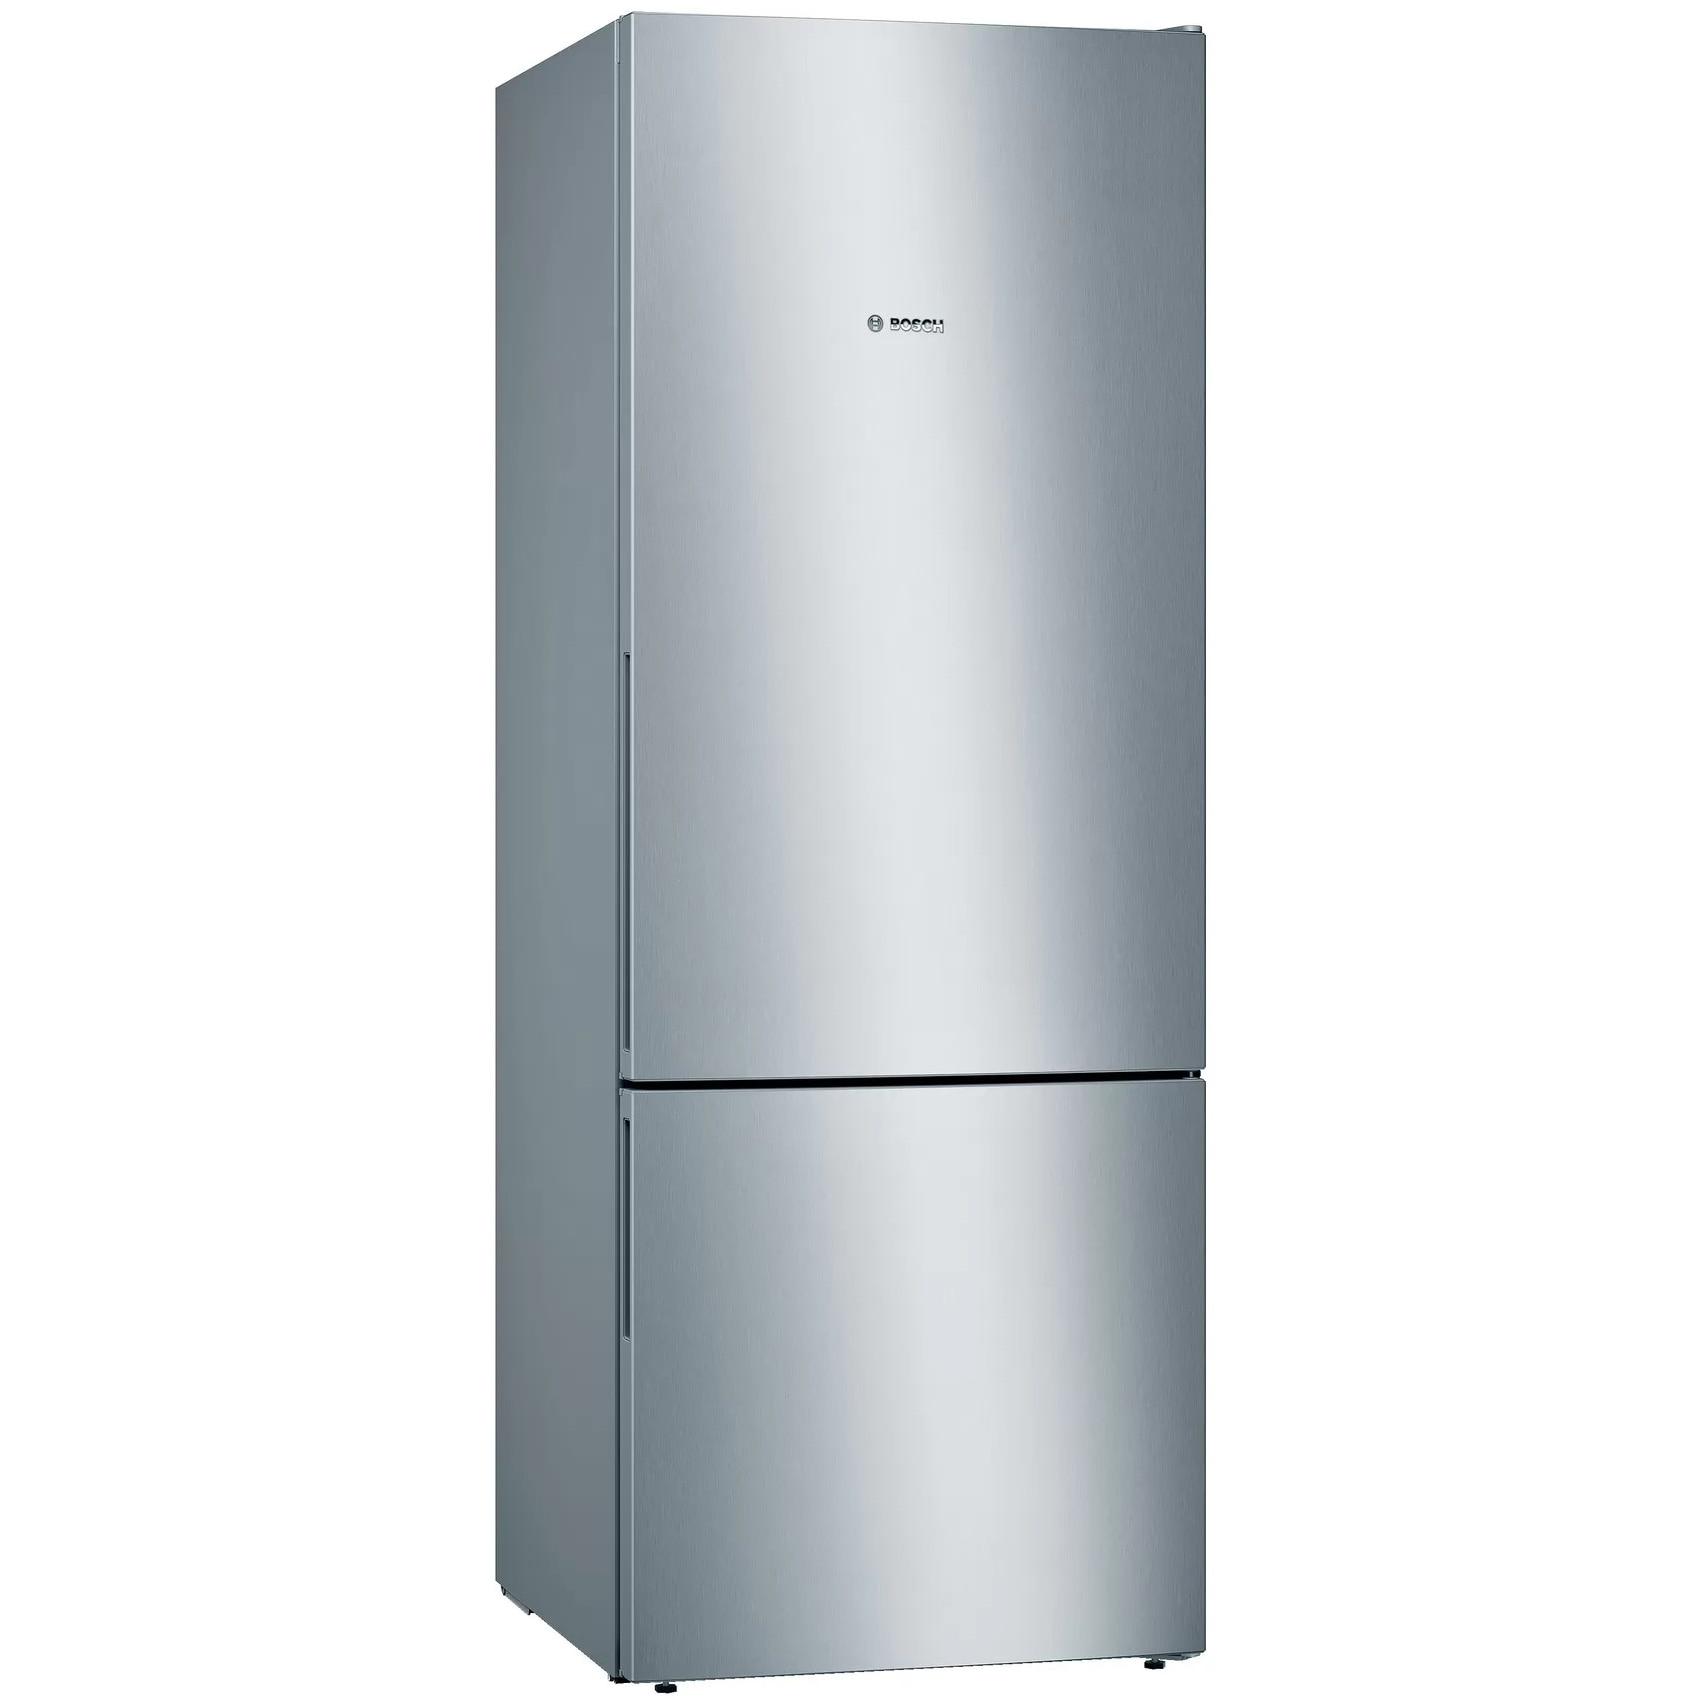 Fotografie Combina frigorifica Bosch KGV58VLEAS, 503 l, Clasa E, Low Frost, VitaFresh, H 191 cm, Argintiu